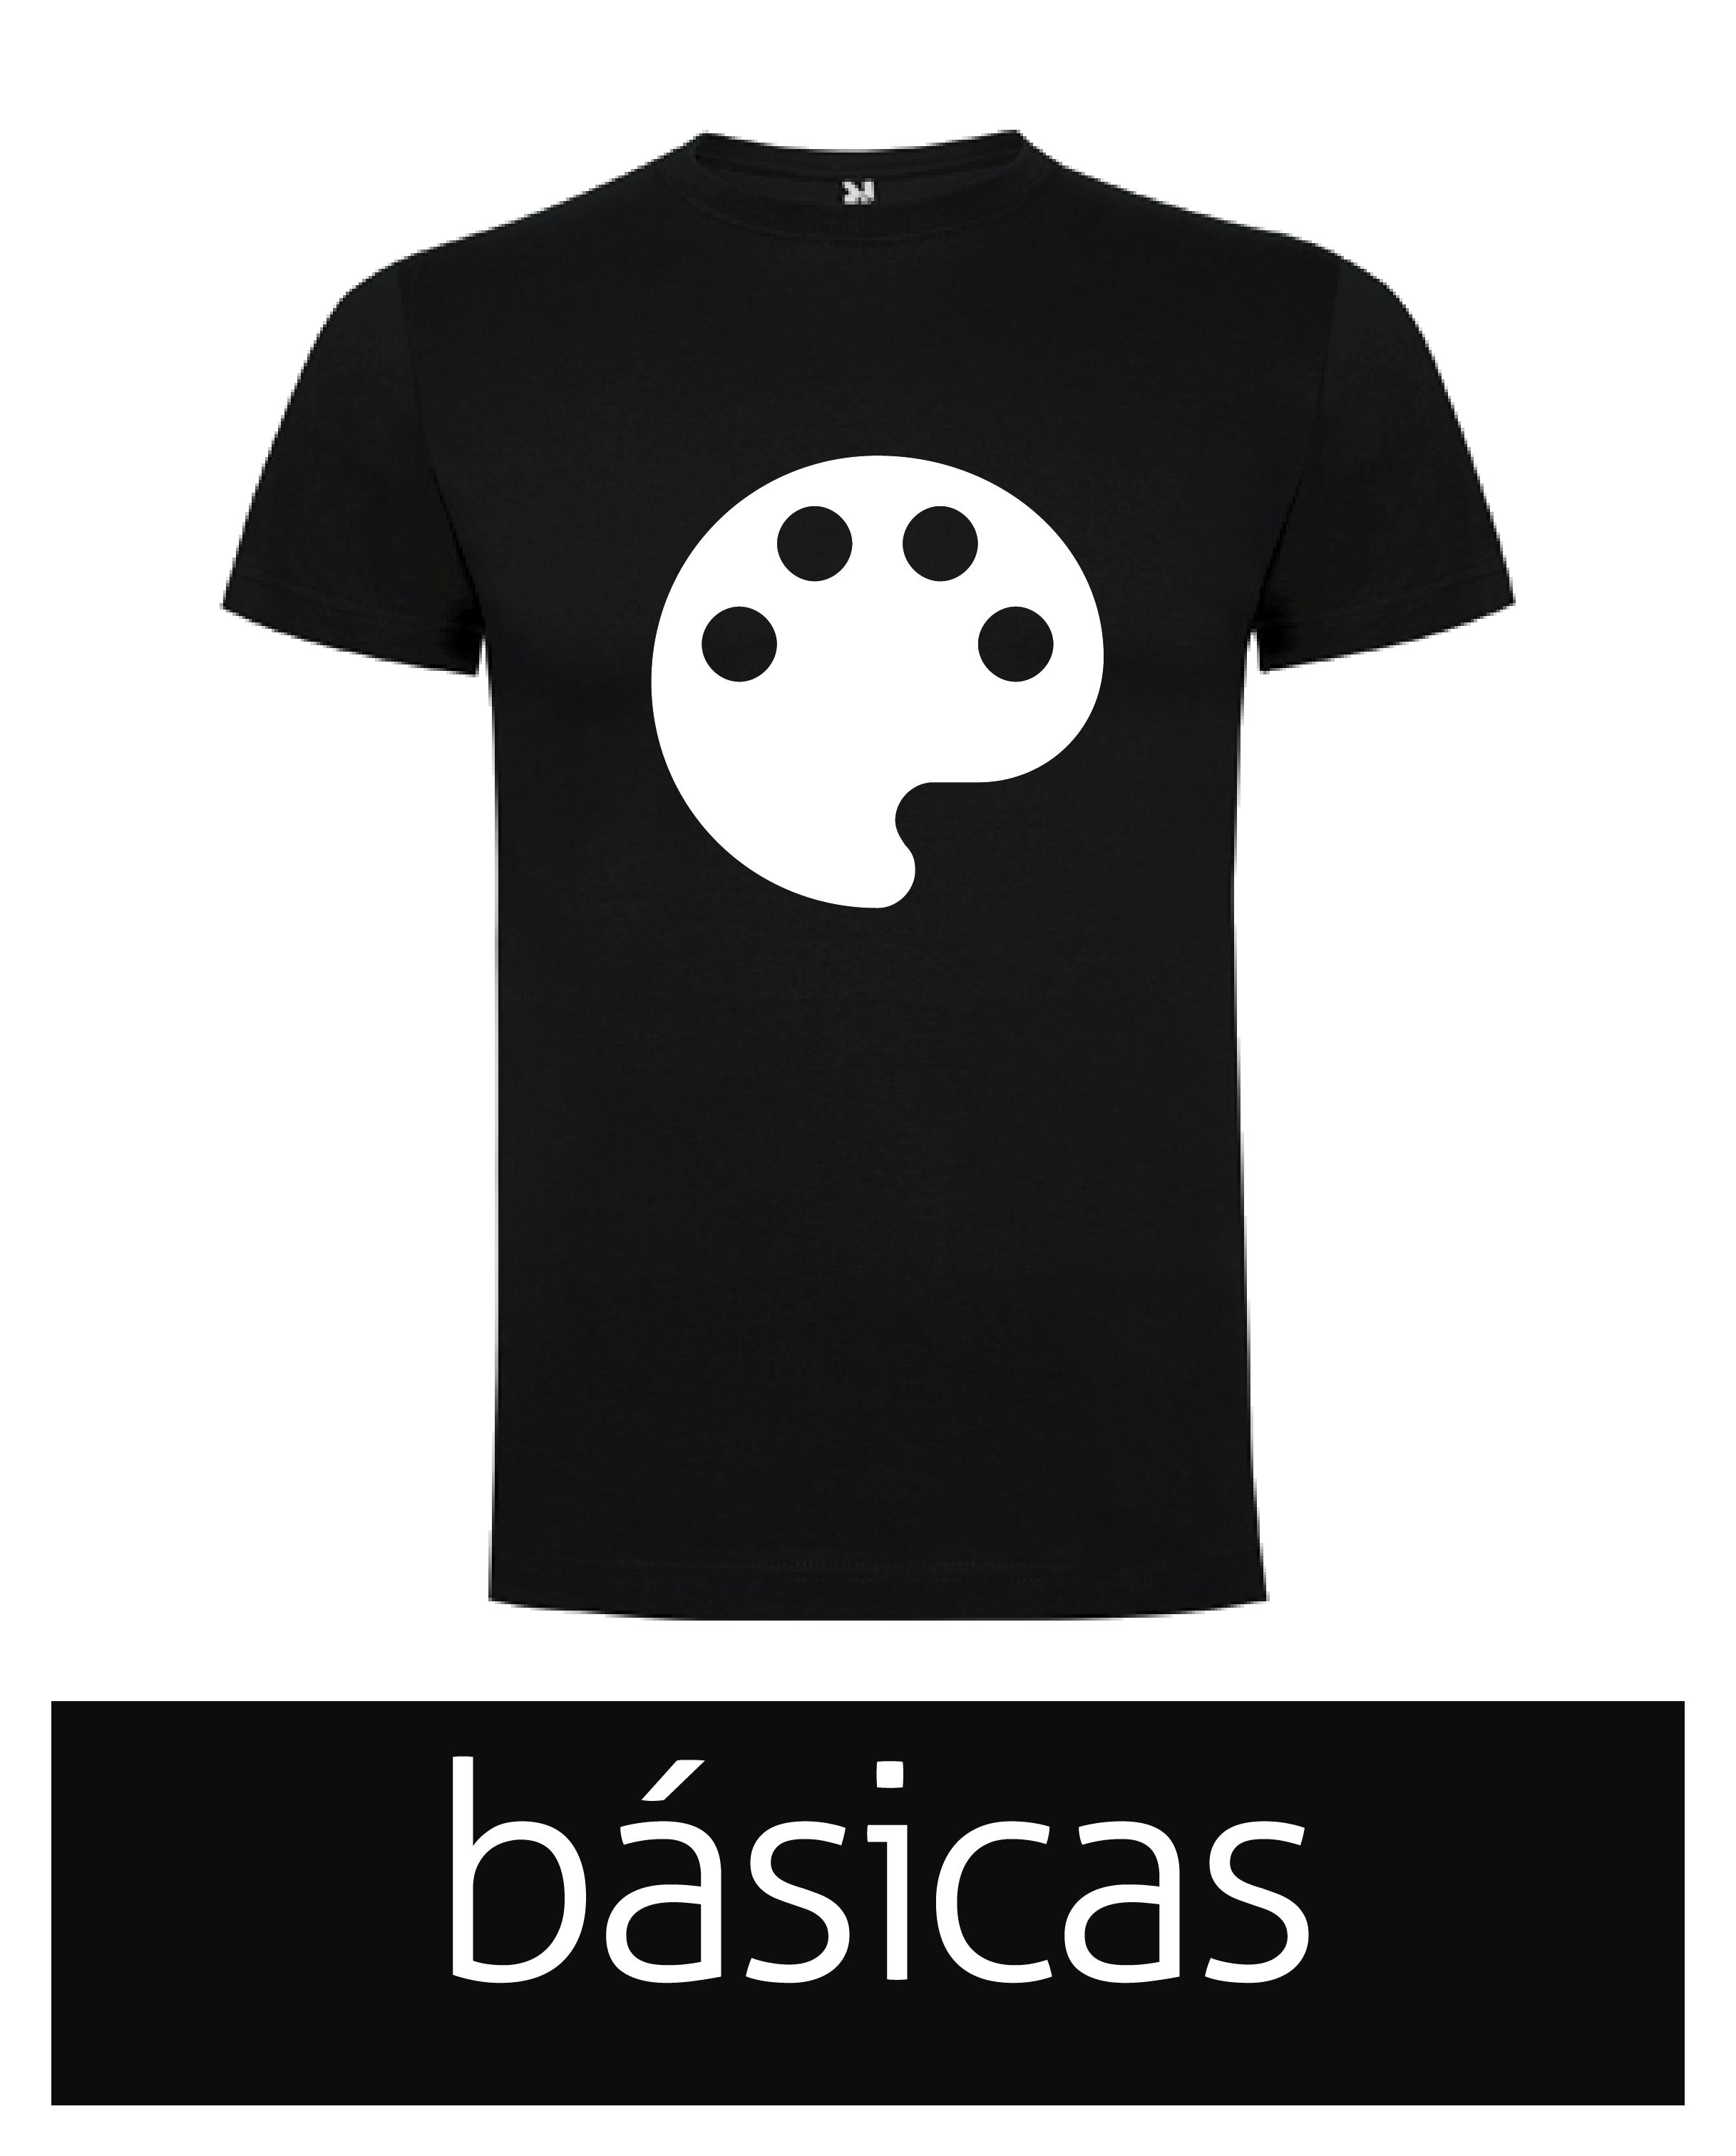 BASICAS.png